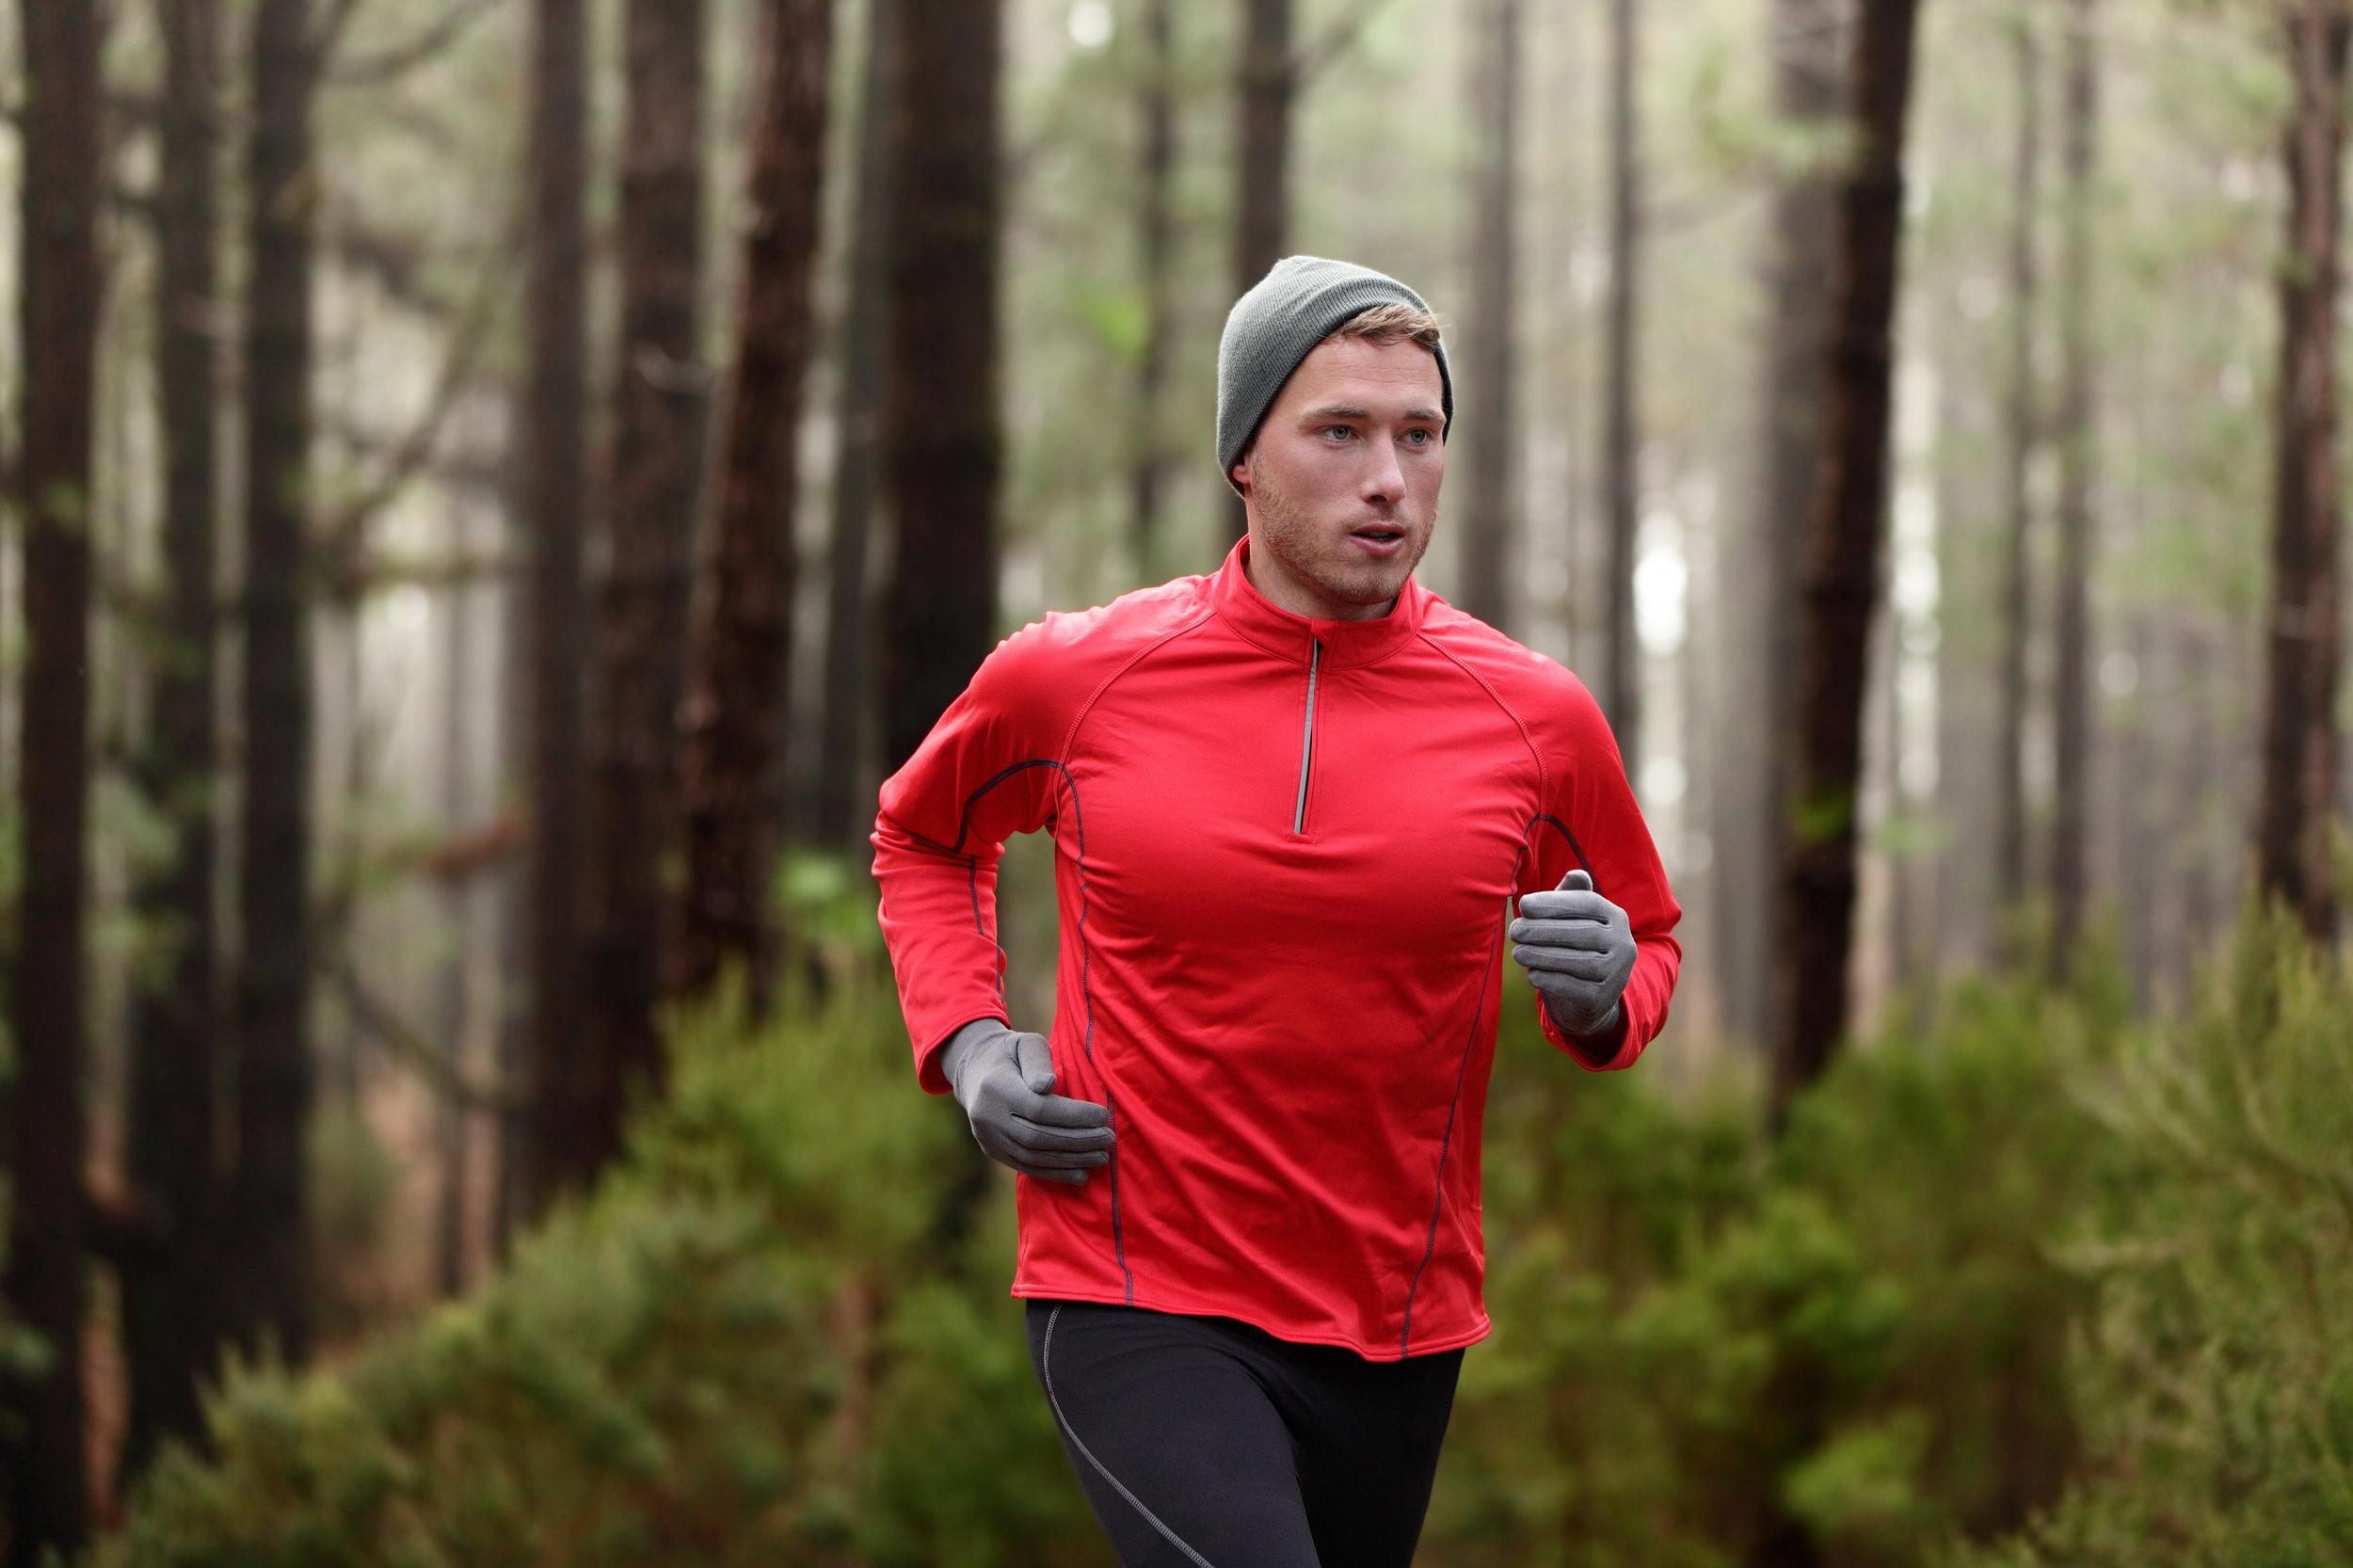 bigstock-Running-man-in-forest-woods-tr-73547167.jpg